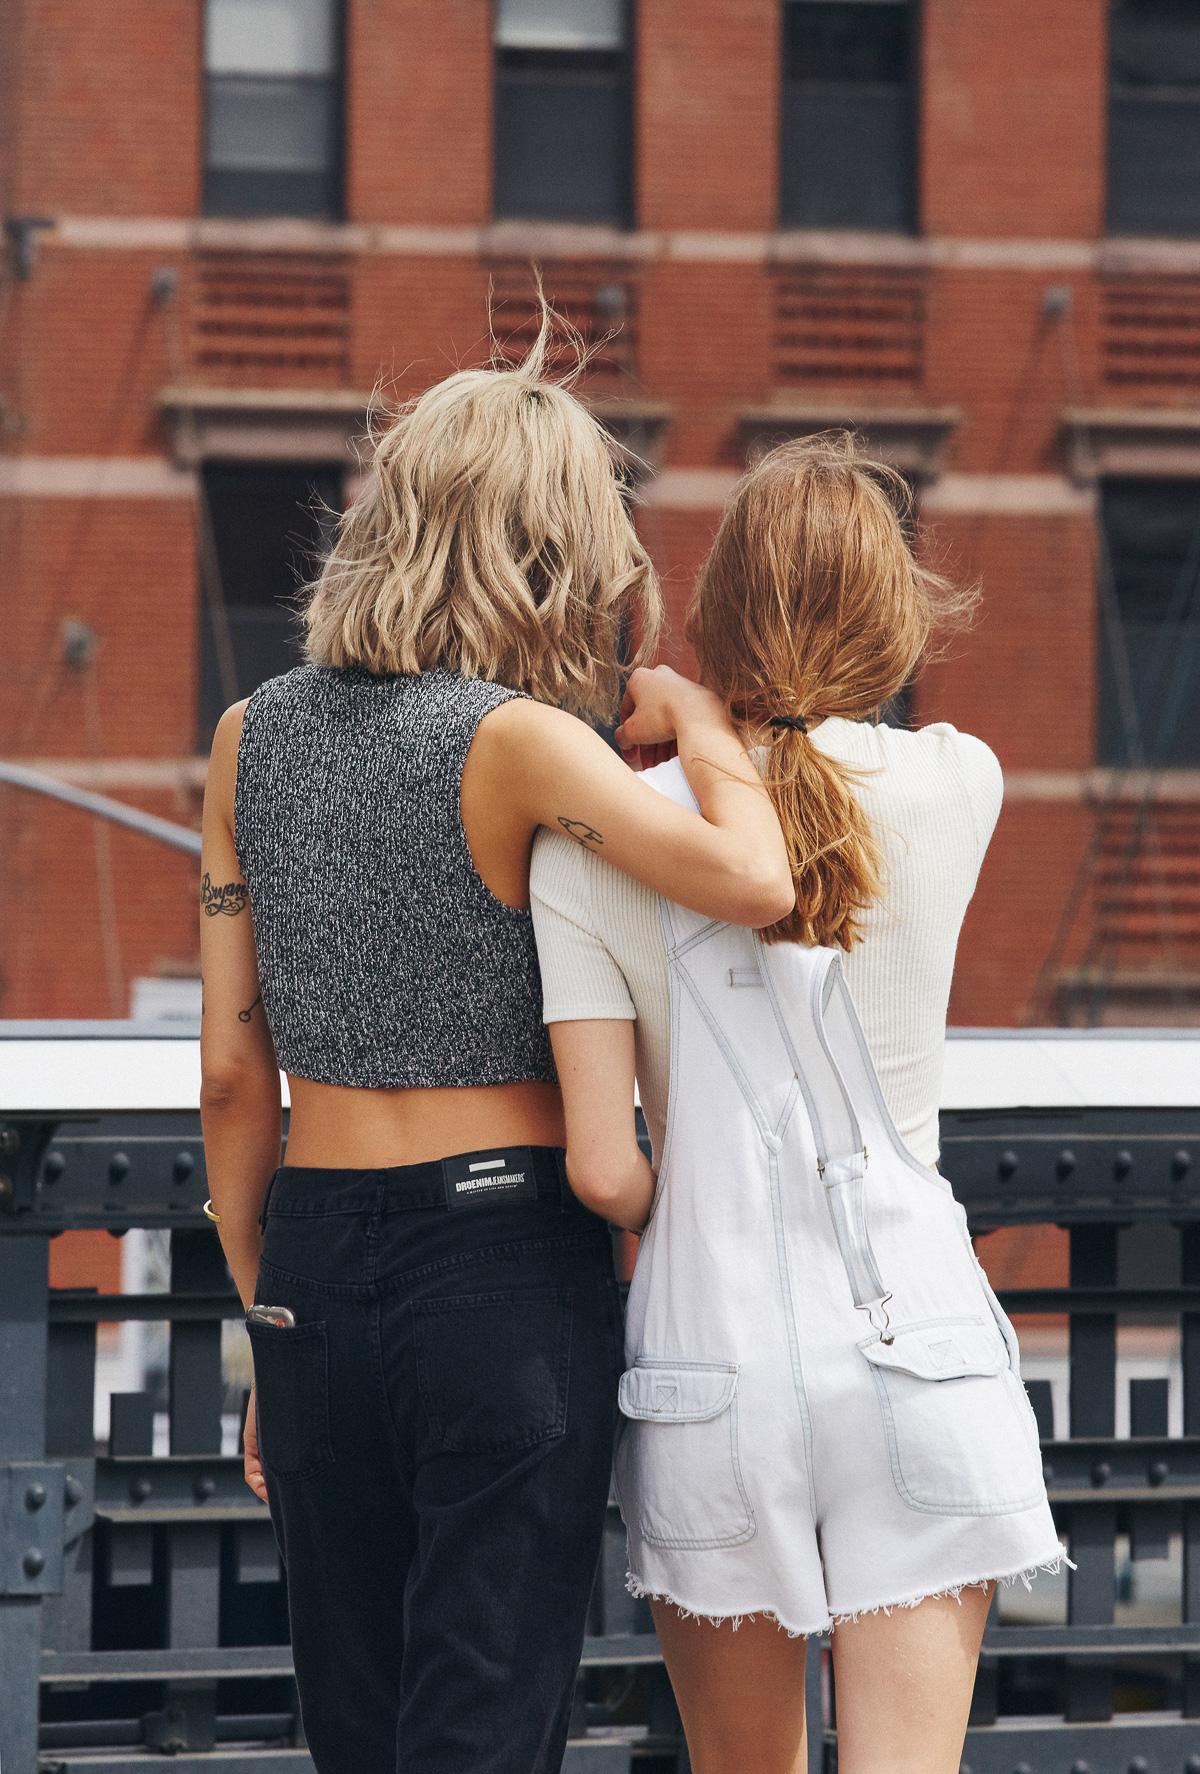 galindo-urban-outfitters-2-44.jpg